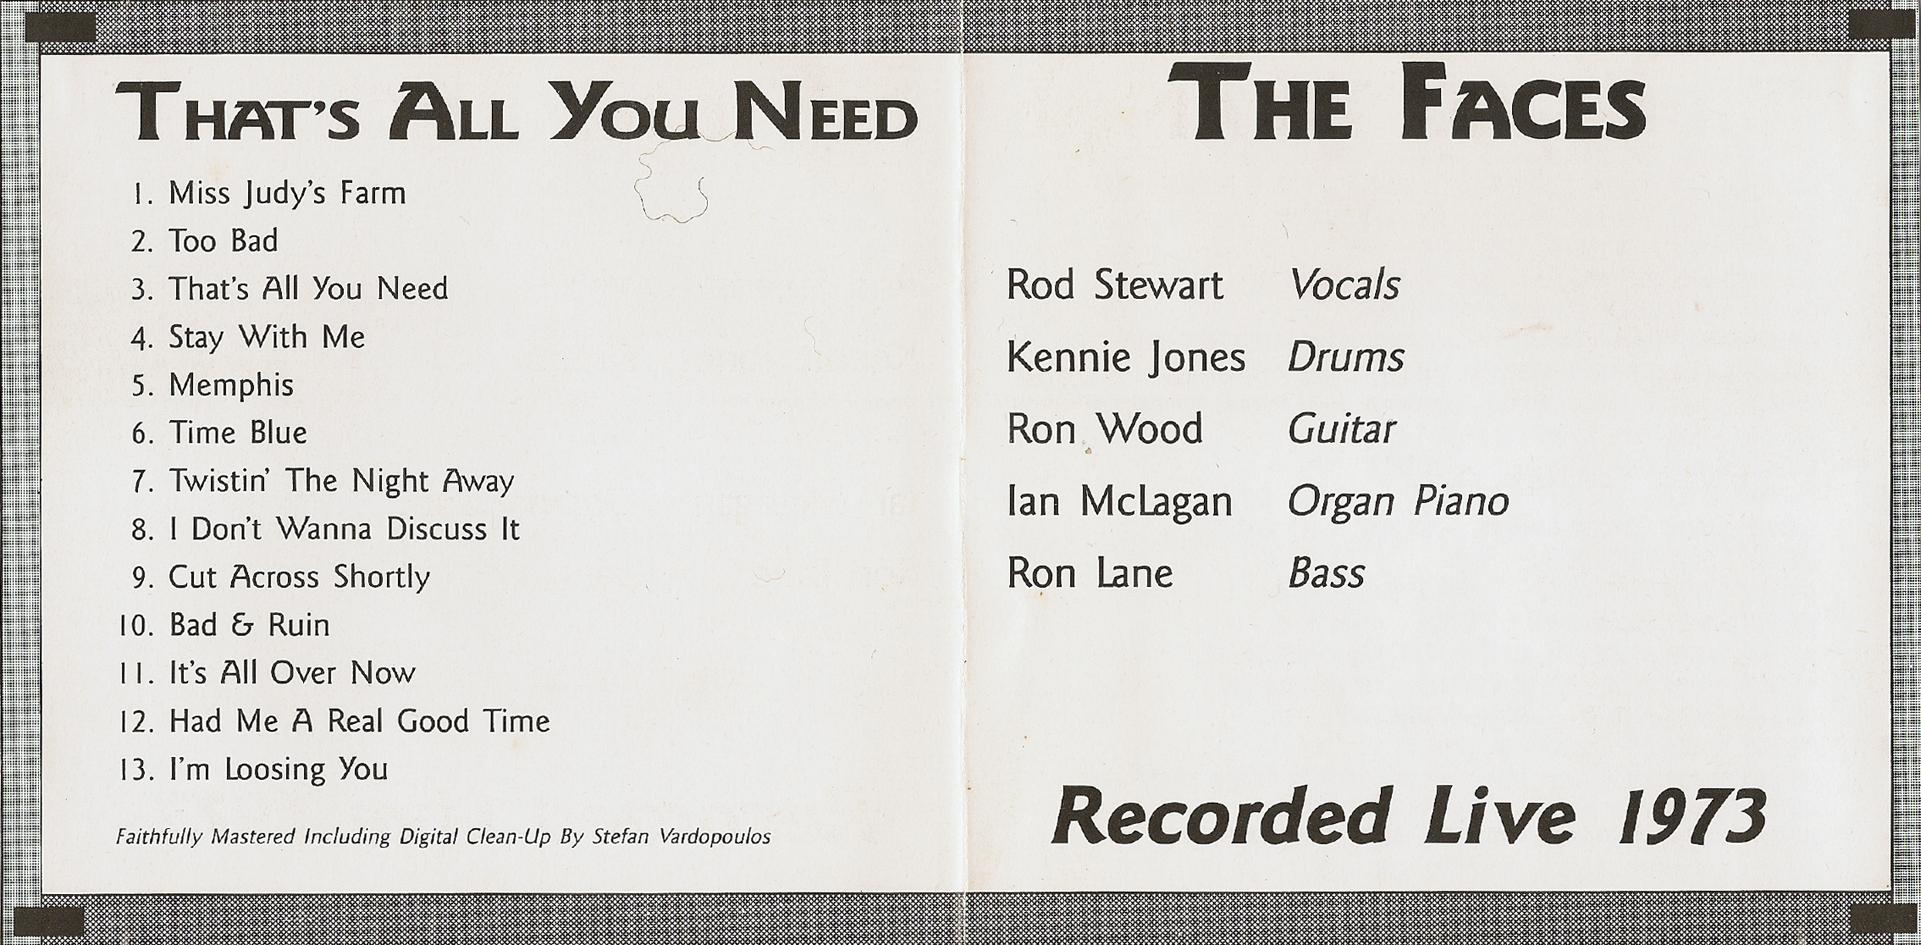 Faces1971-1973BBCLondonUK.jpg